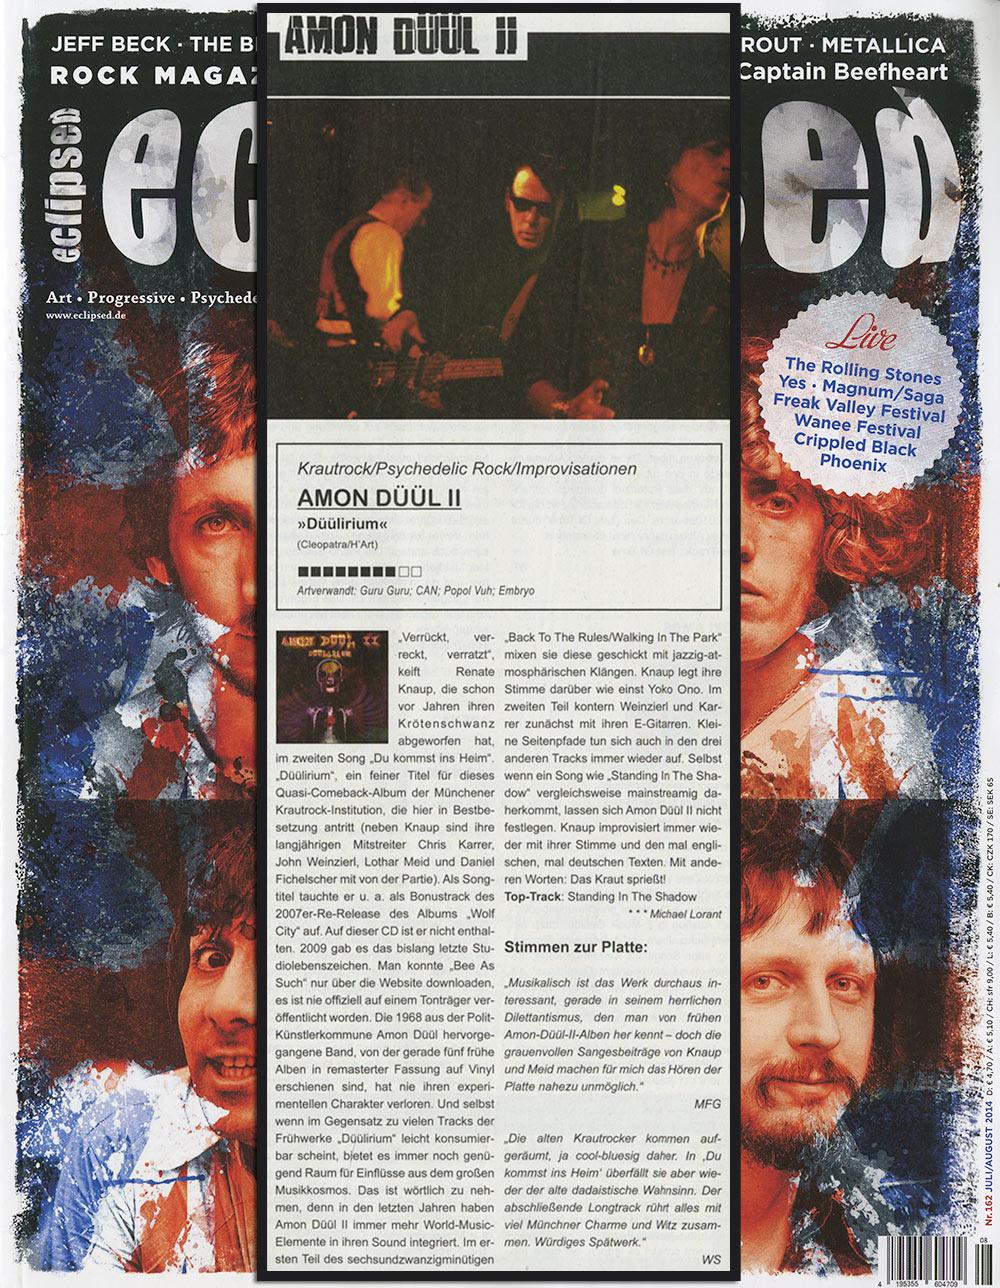 Review - Amon Düül II - Düülirium - Eclipsed.de (8/10)